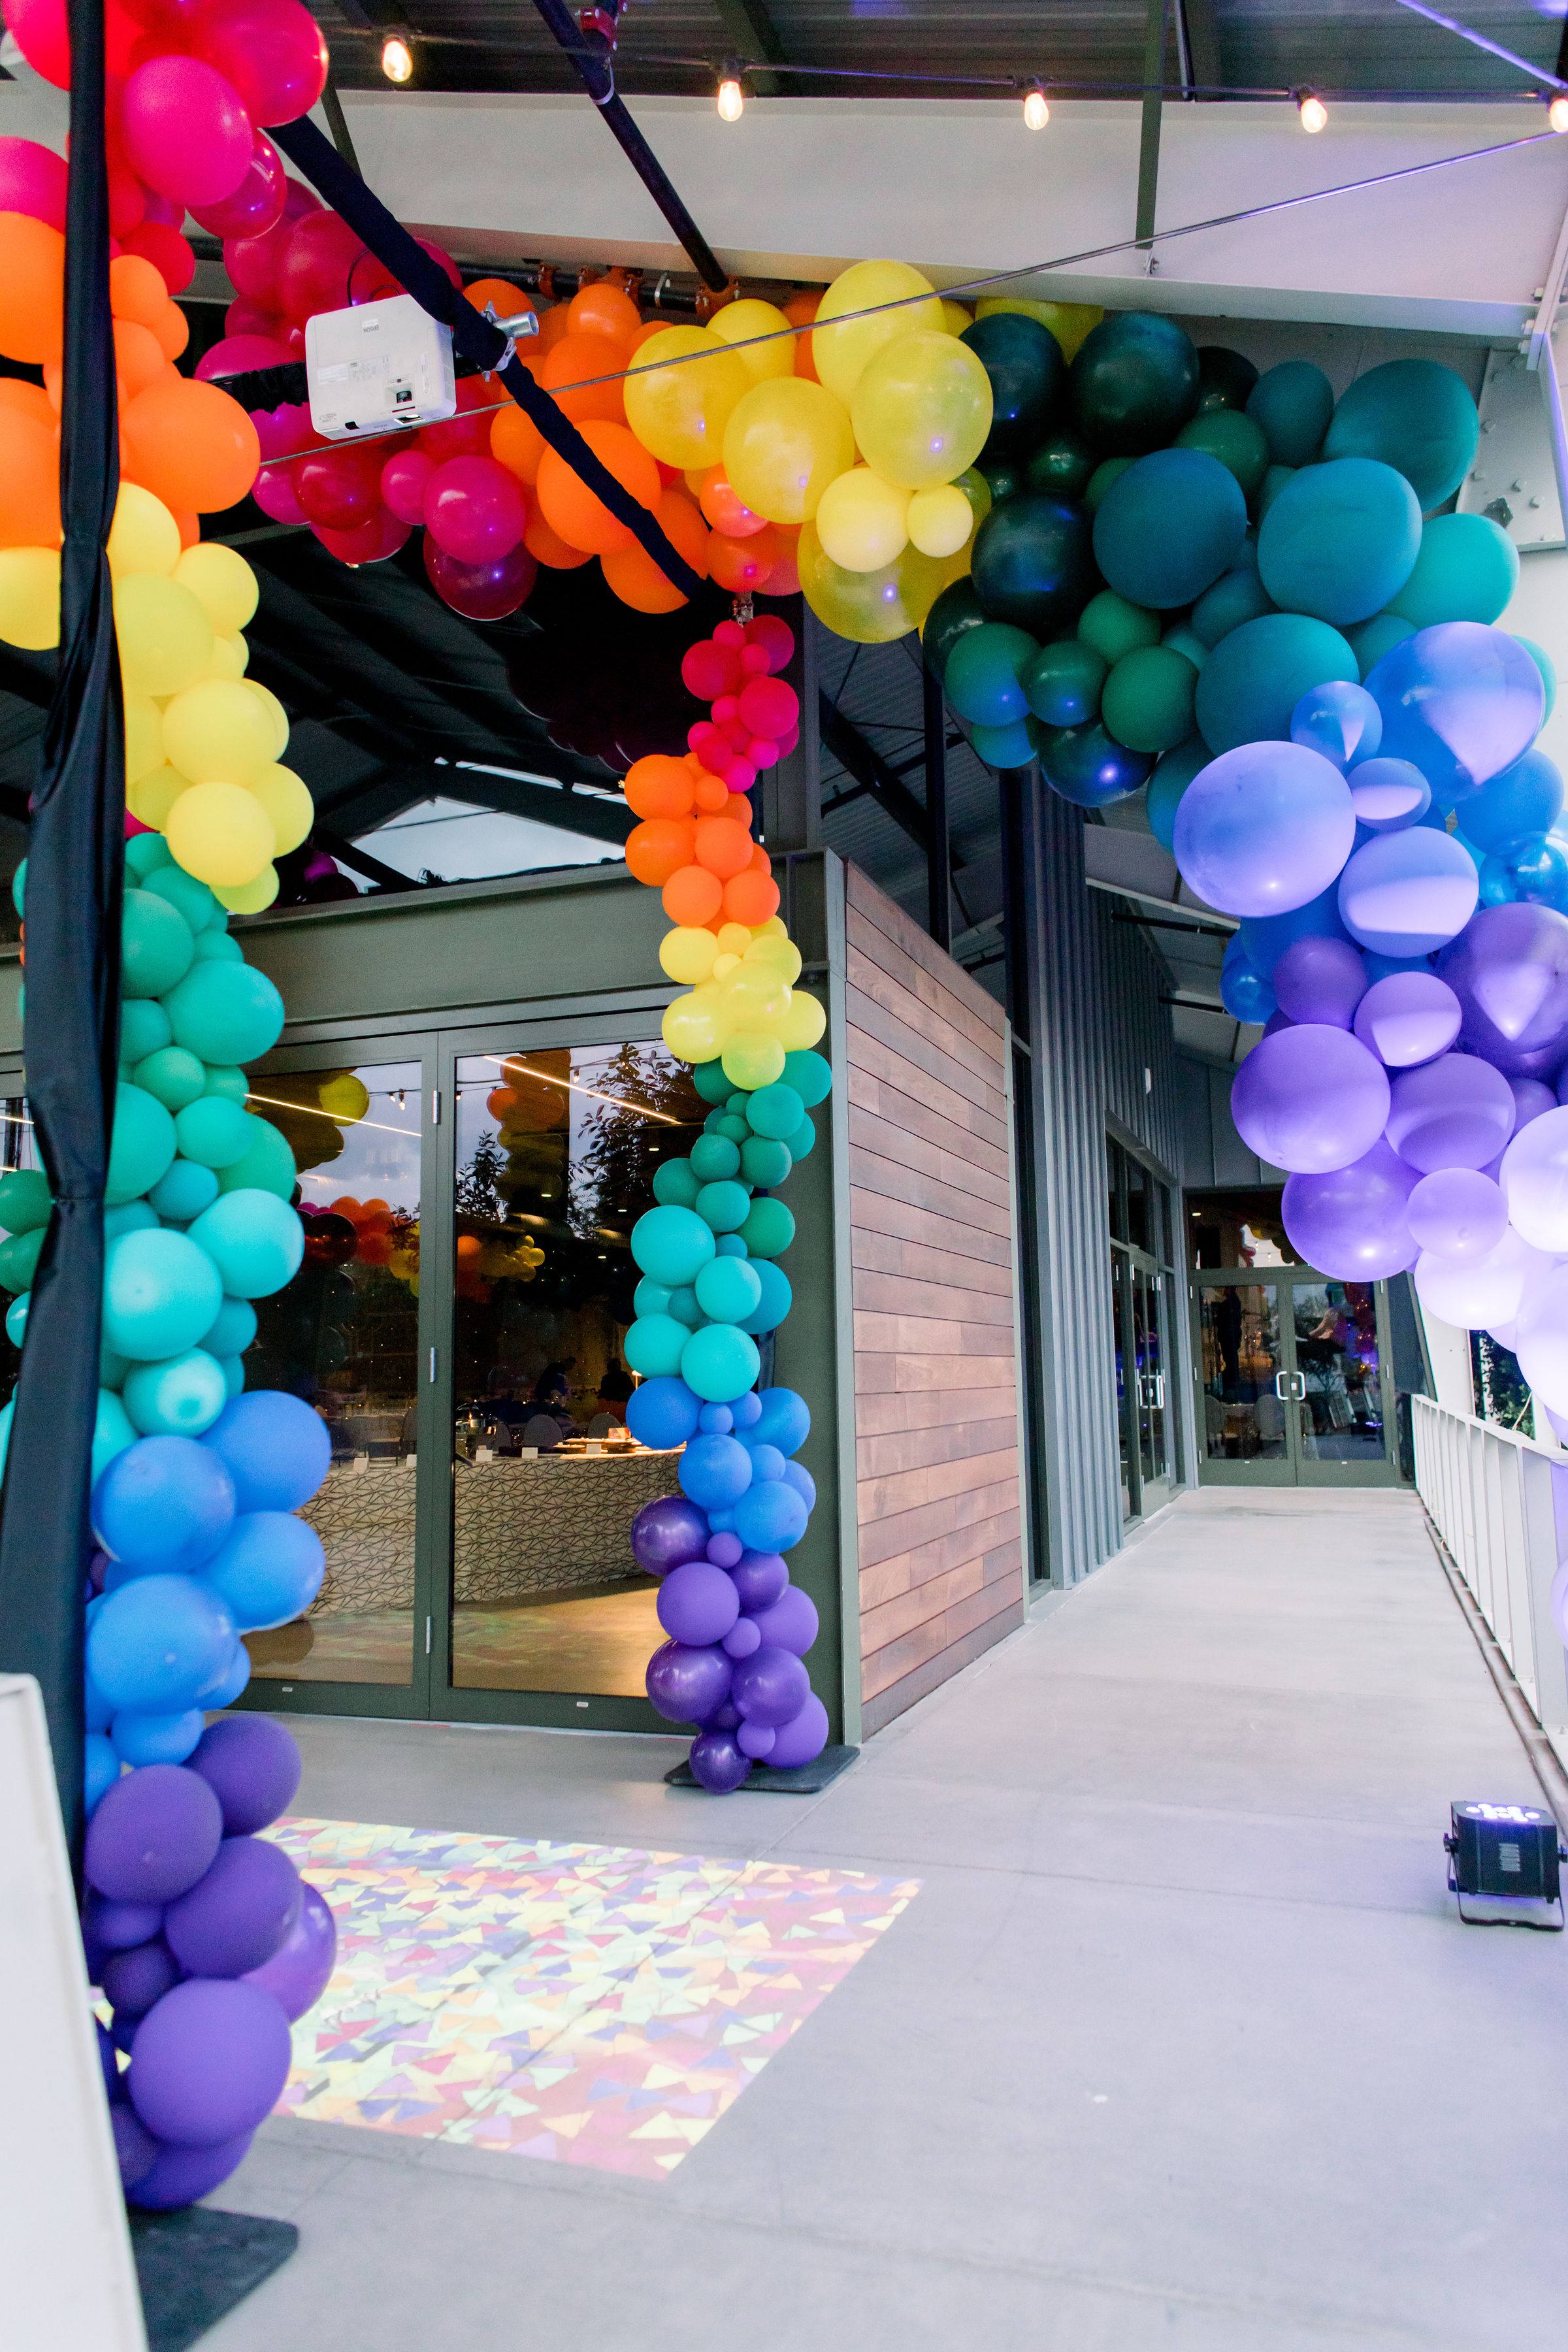 7 rainbow balloon arch organic rainbow balloon garland party balloon garland Life Design Events photos by Stephanie Heymann Photography.jpg